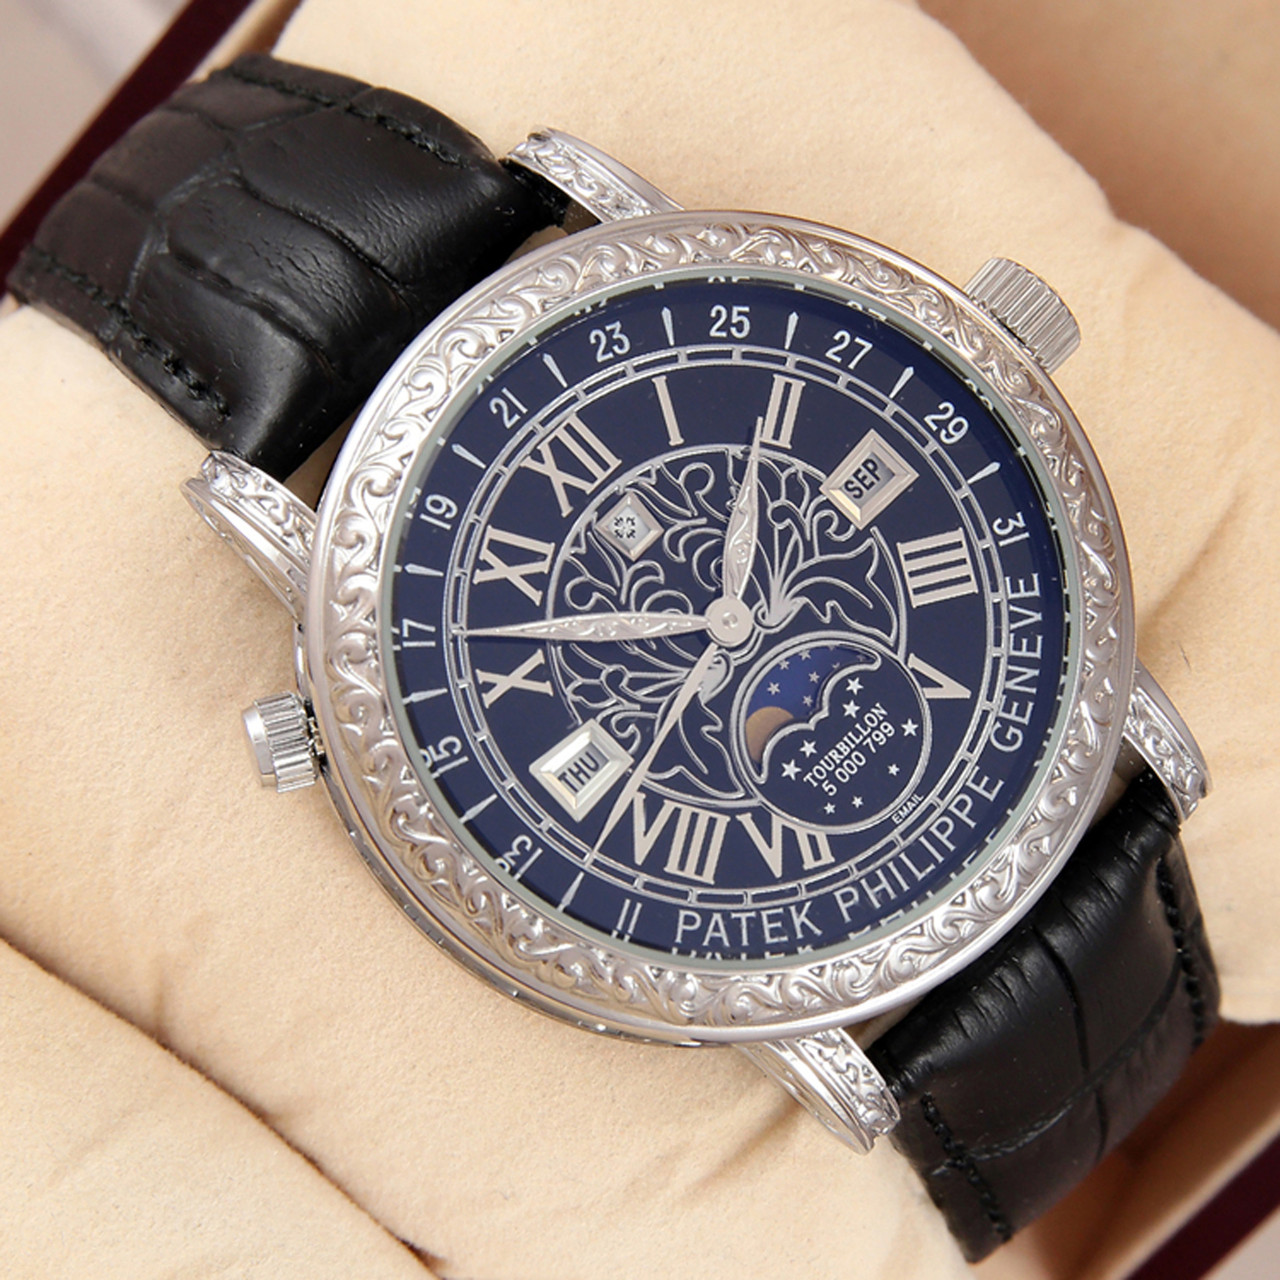 b1e6d158 Мужские наручные часы Patek Philippe Grand Complication Sky Moon 28p реплика  - Магазин подарков Часики в